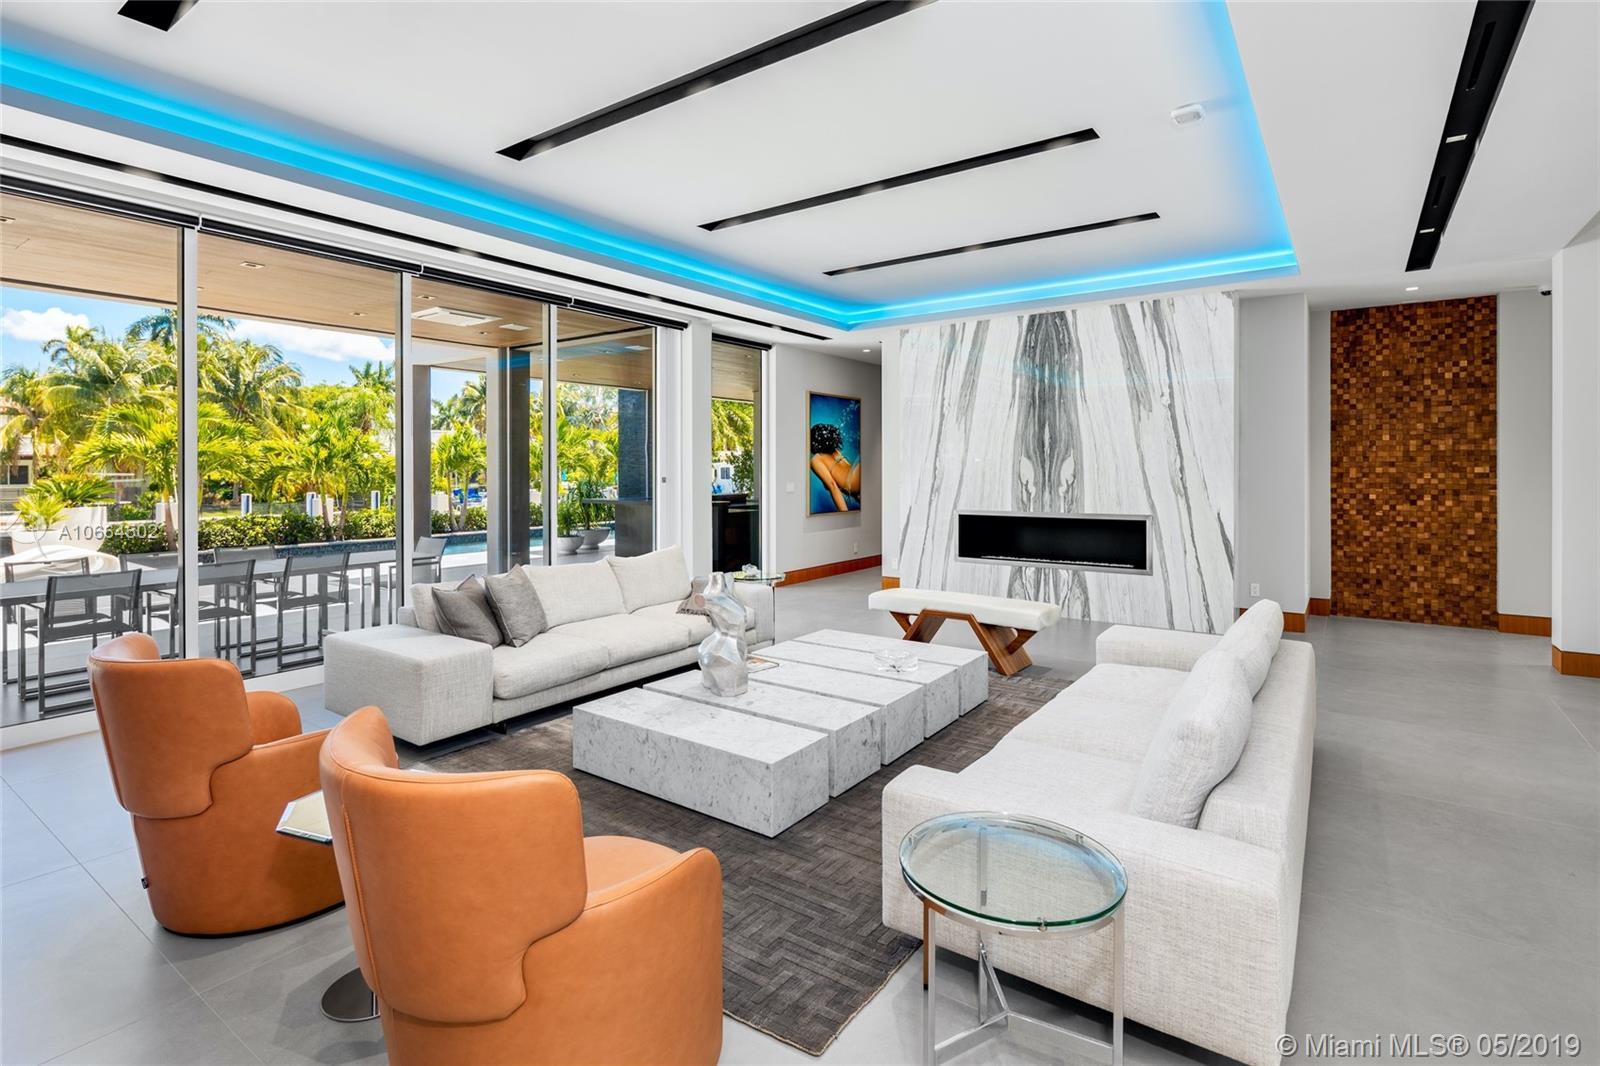 Homes for Sale in Zip Code 33301